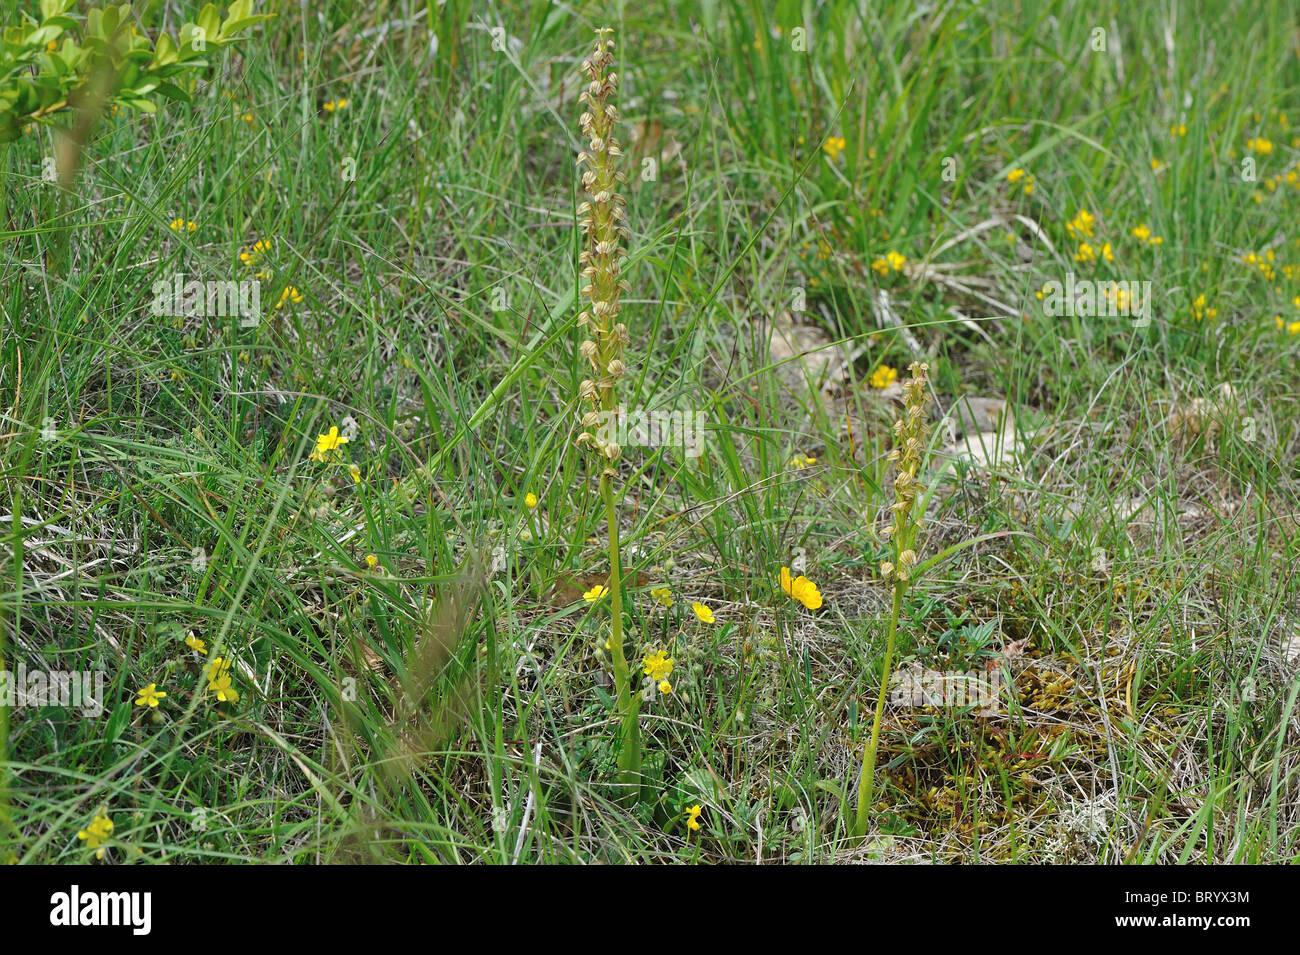 Man orchid (Aceras anthropophorum - Orchis anthropophora) flowering at spring - Cevennes - France - Stock Image